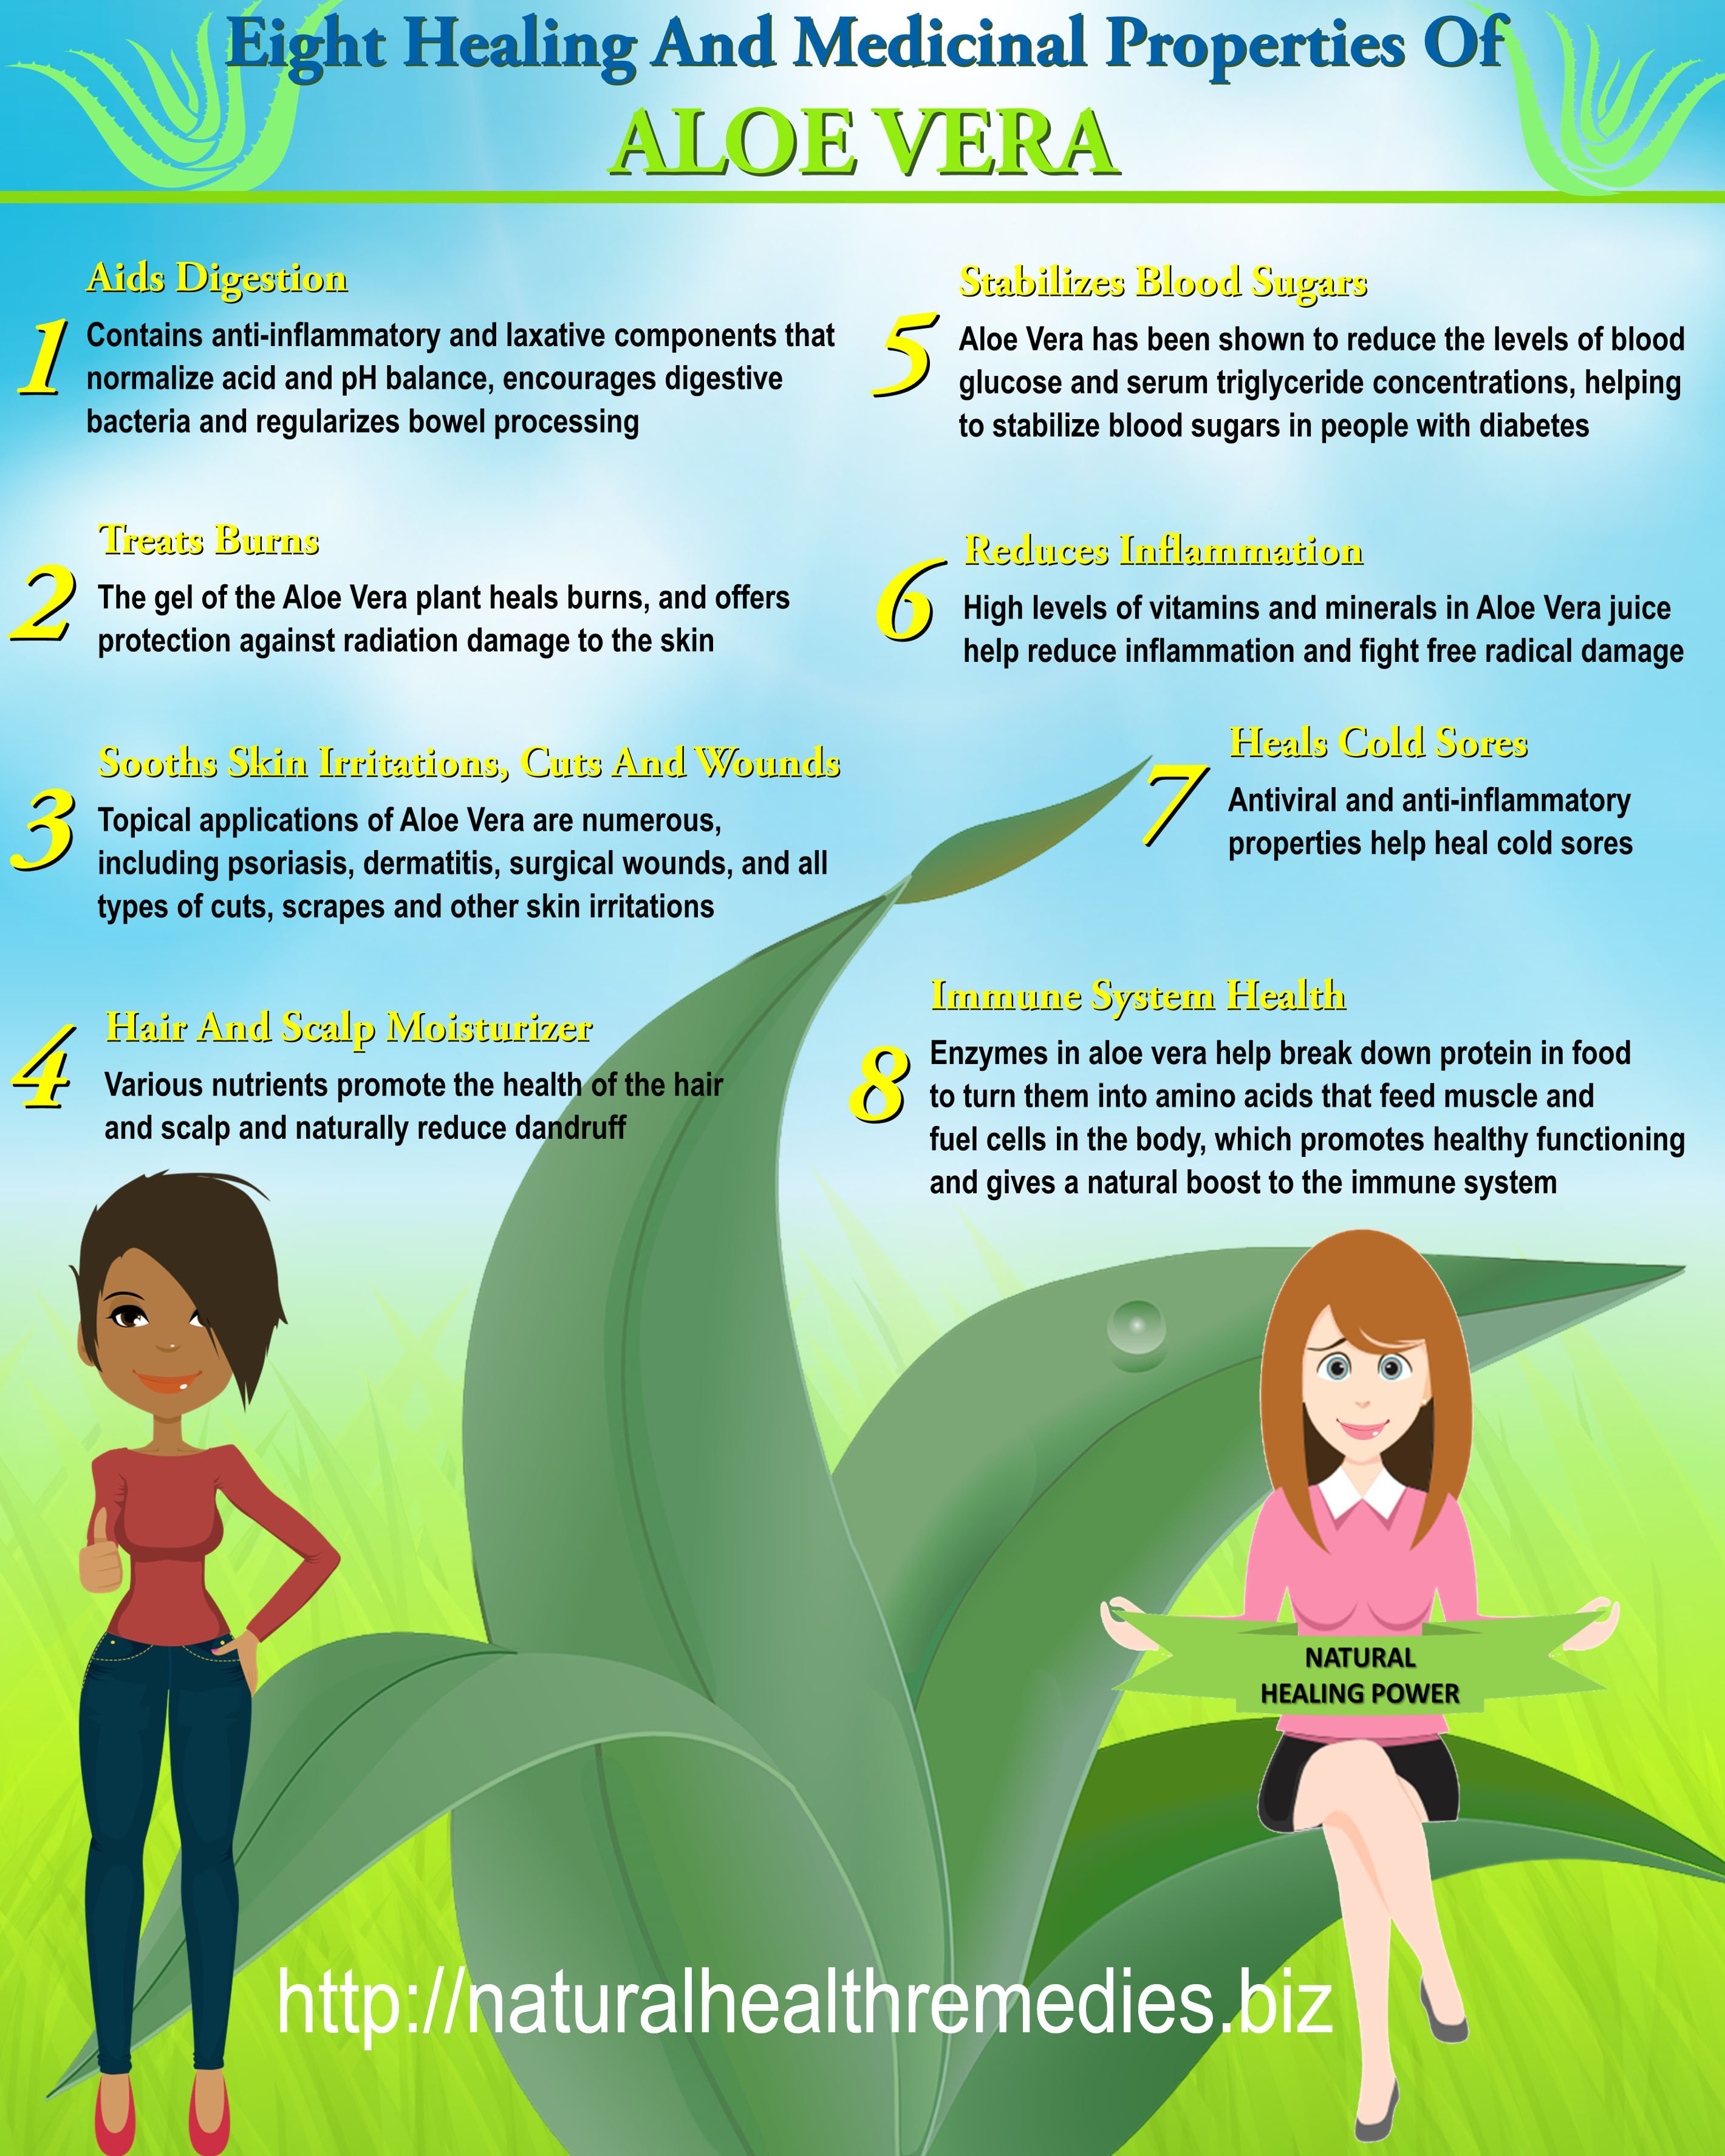 The Healing And Medicinal Properties Of Aloe Vera